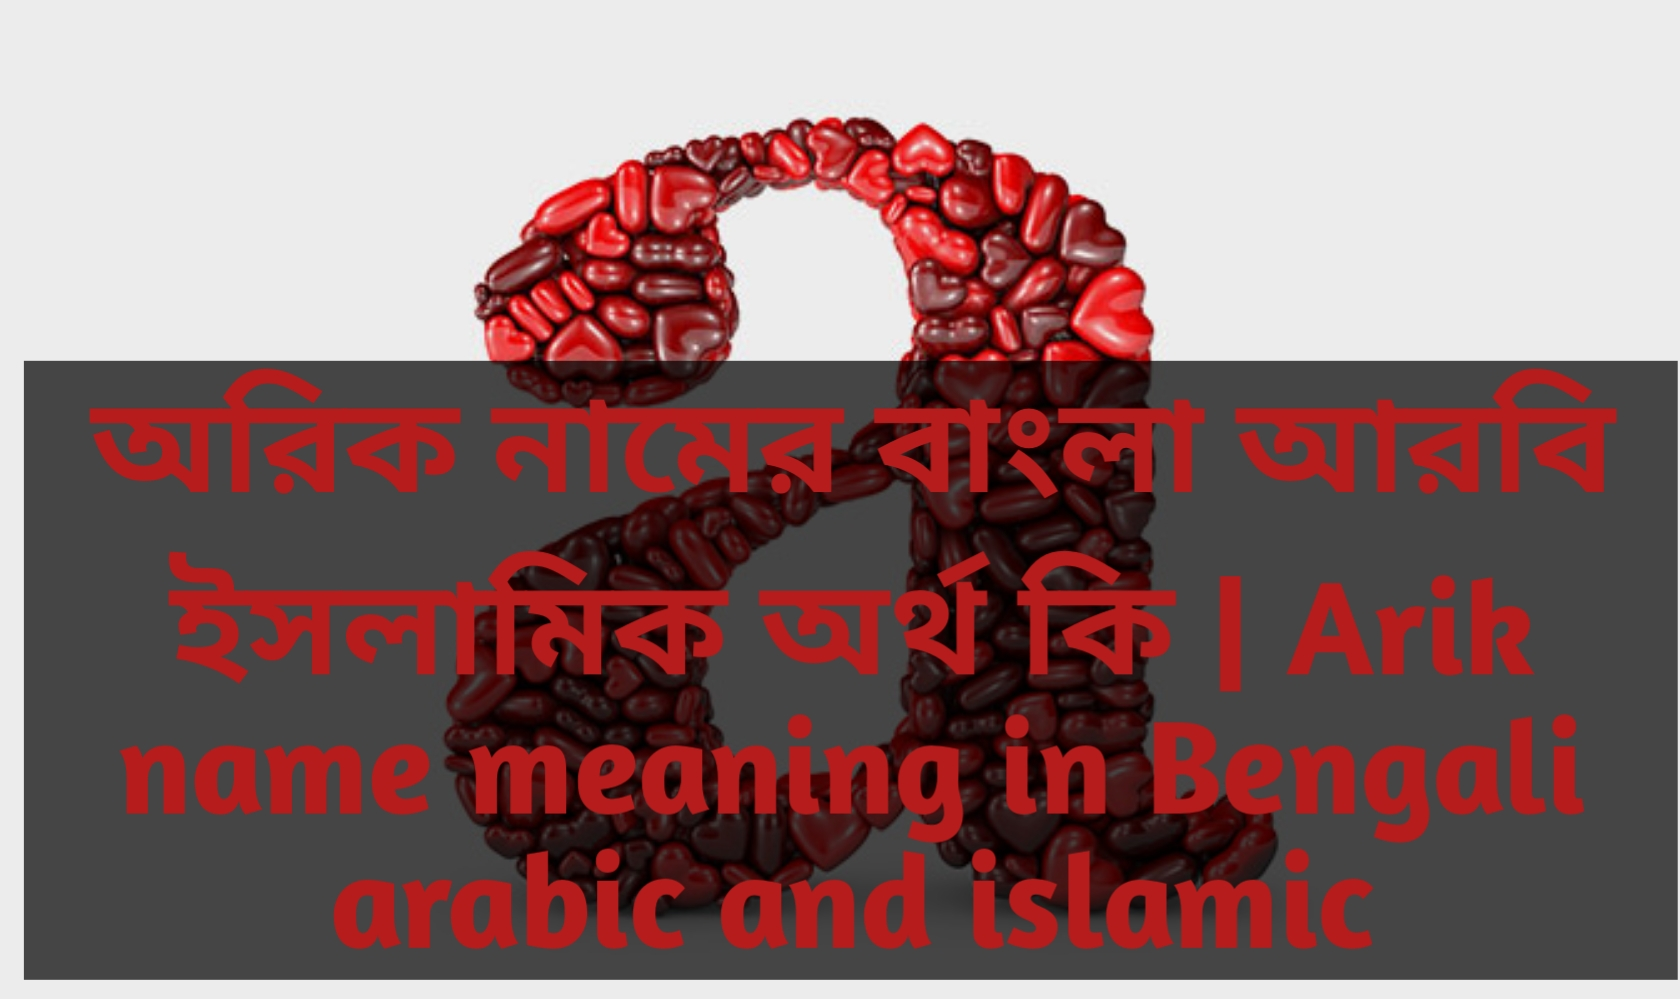 Arik name meaning in Bengali, অরিক নামের অর্থ কি, অরিক নামের বাংলা অর্থ কি, অরিক নামের ইসলামিক অর্থ কি,